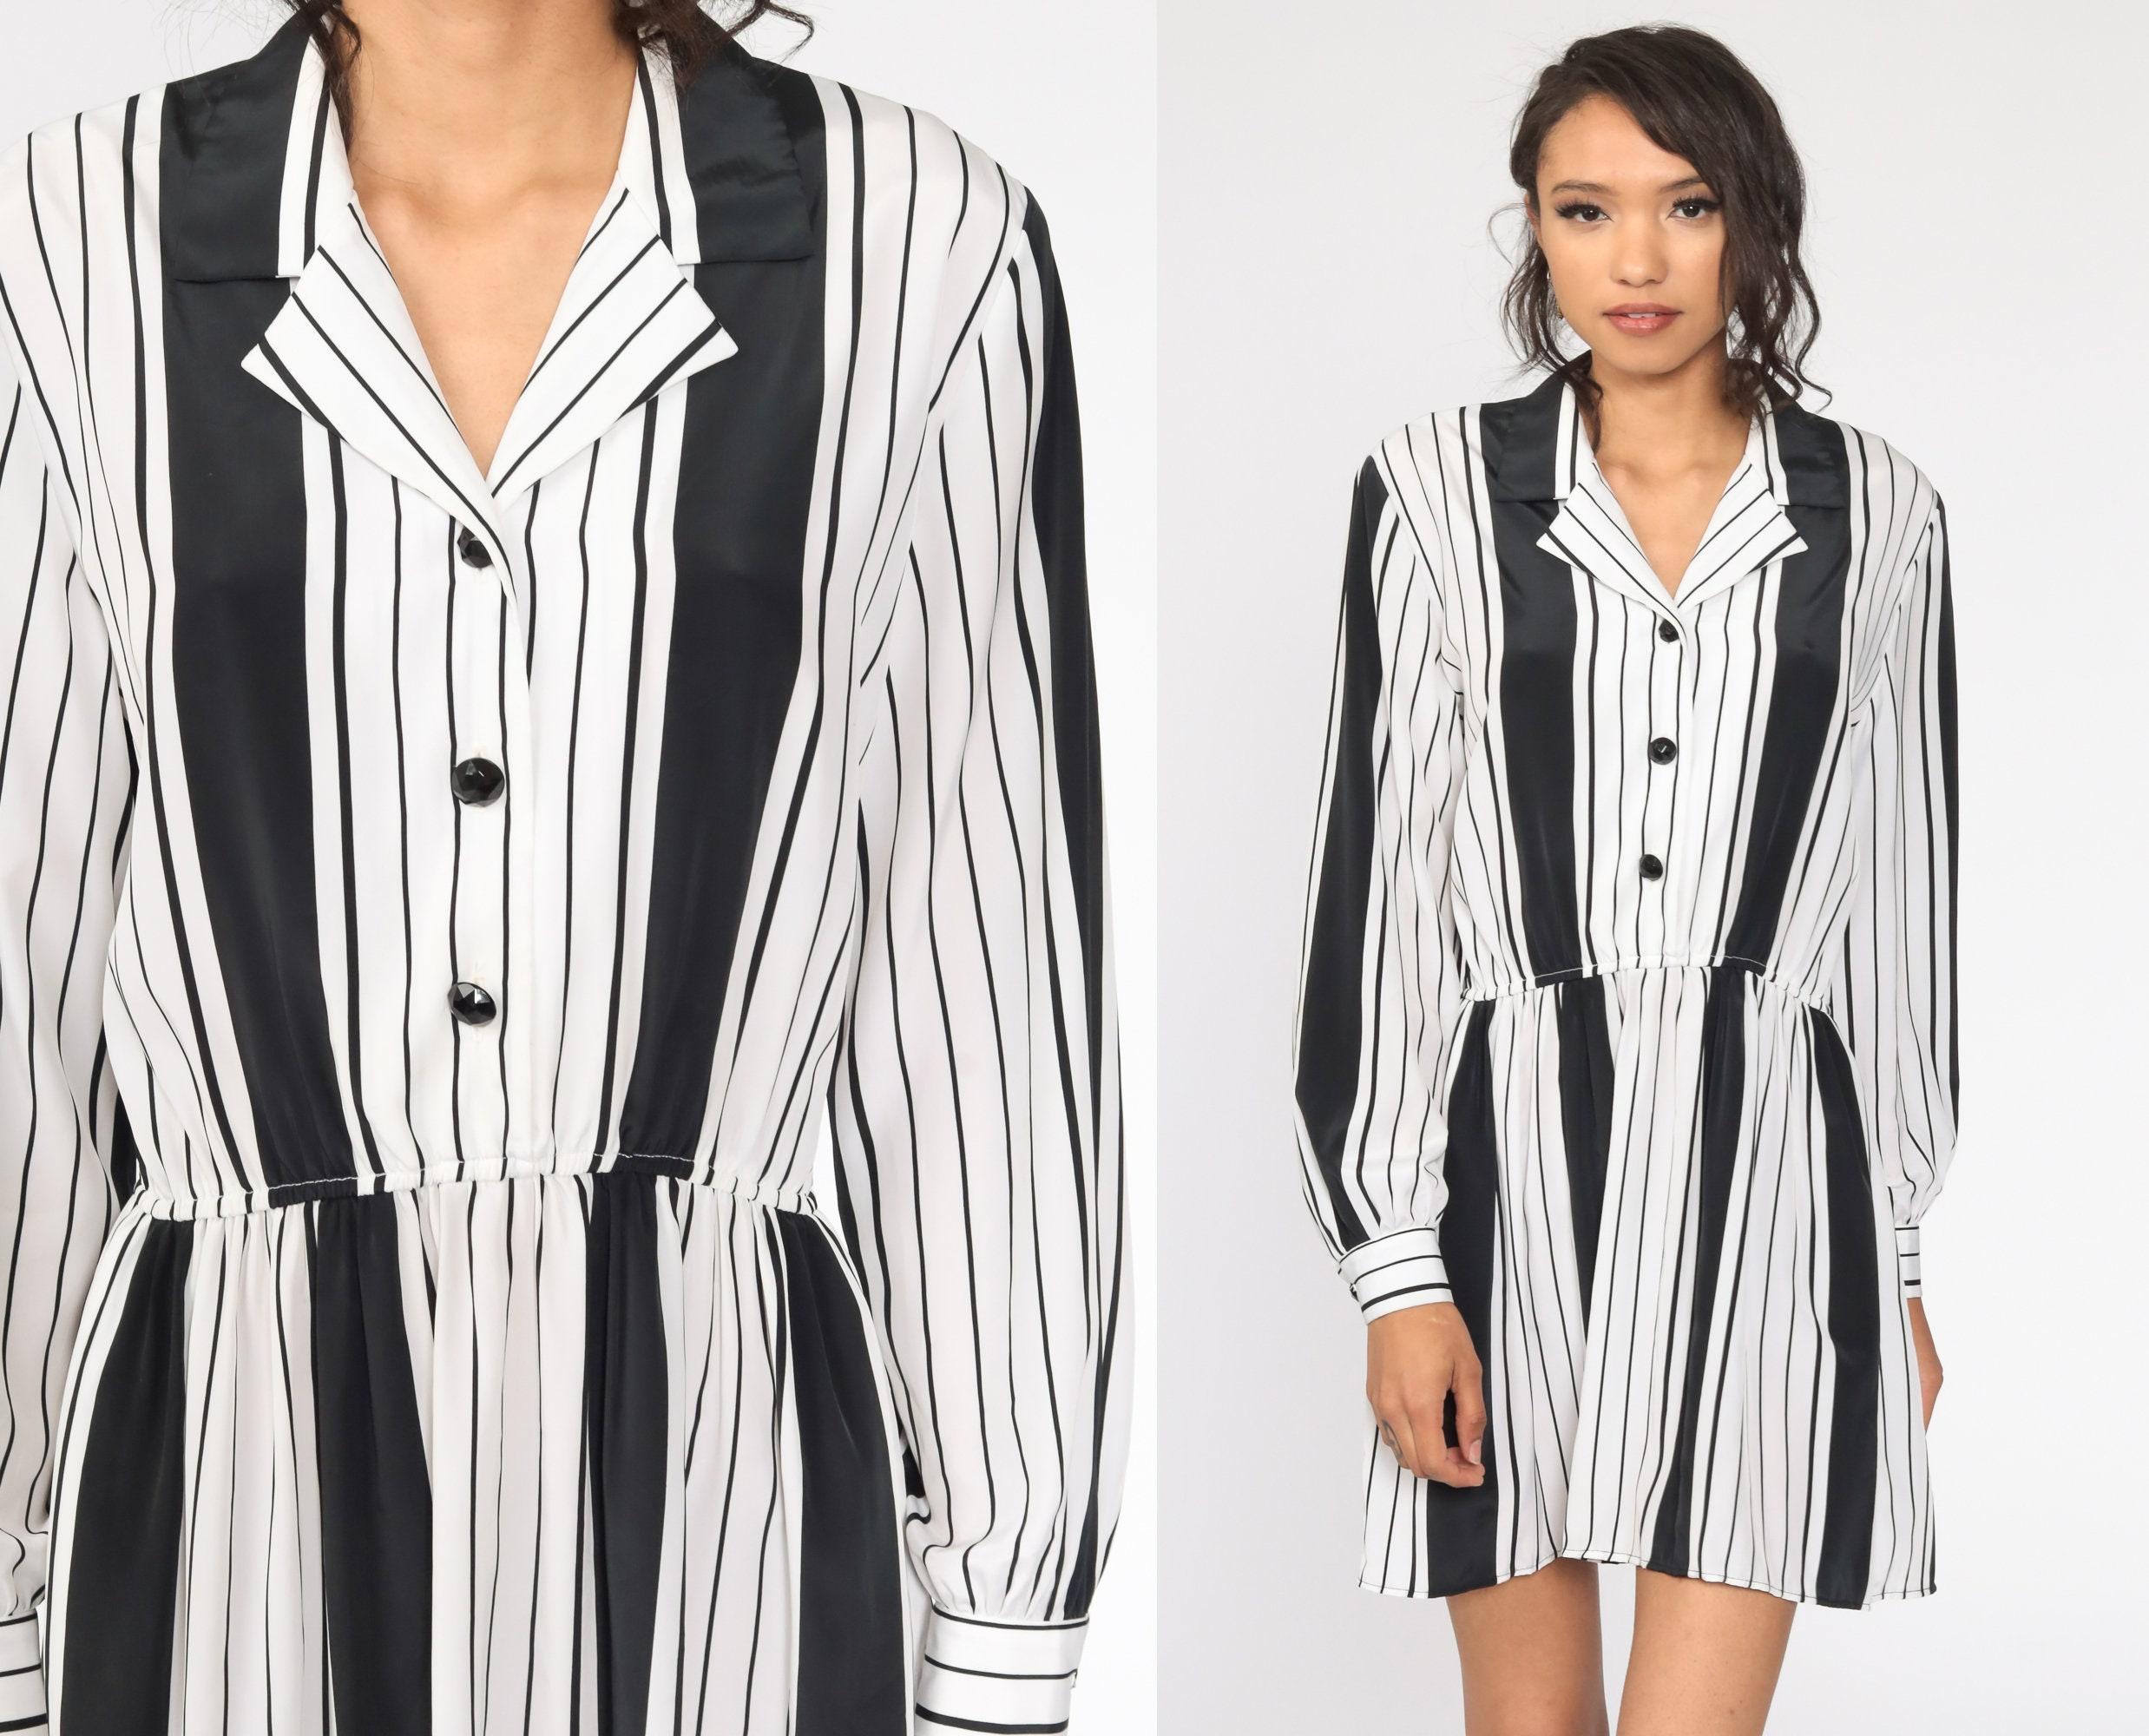 80s Dresses | Casual to Party Dresses striped Button Up Dress 80S Mini Black White High Waisted Boho Secretary Vintage 1980S Minidress Medium $5.95 AT vintagedancer.com